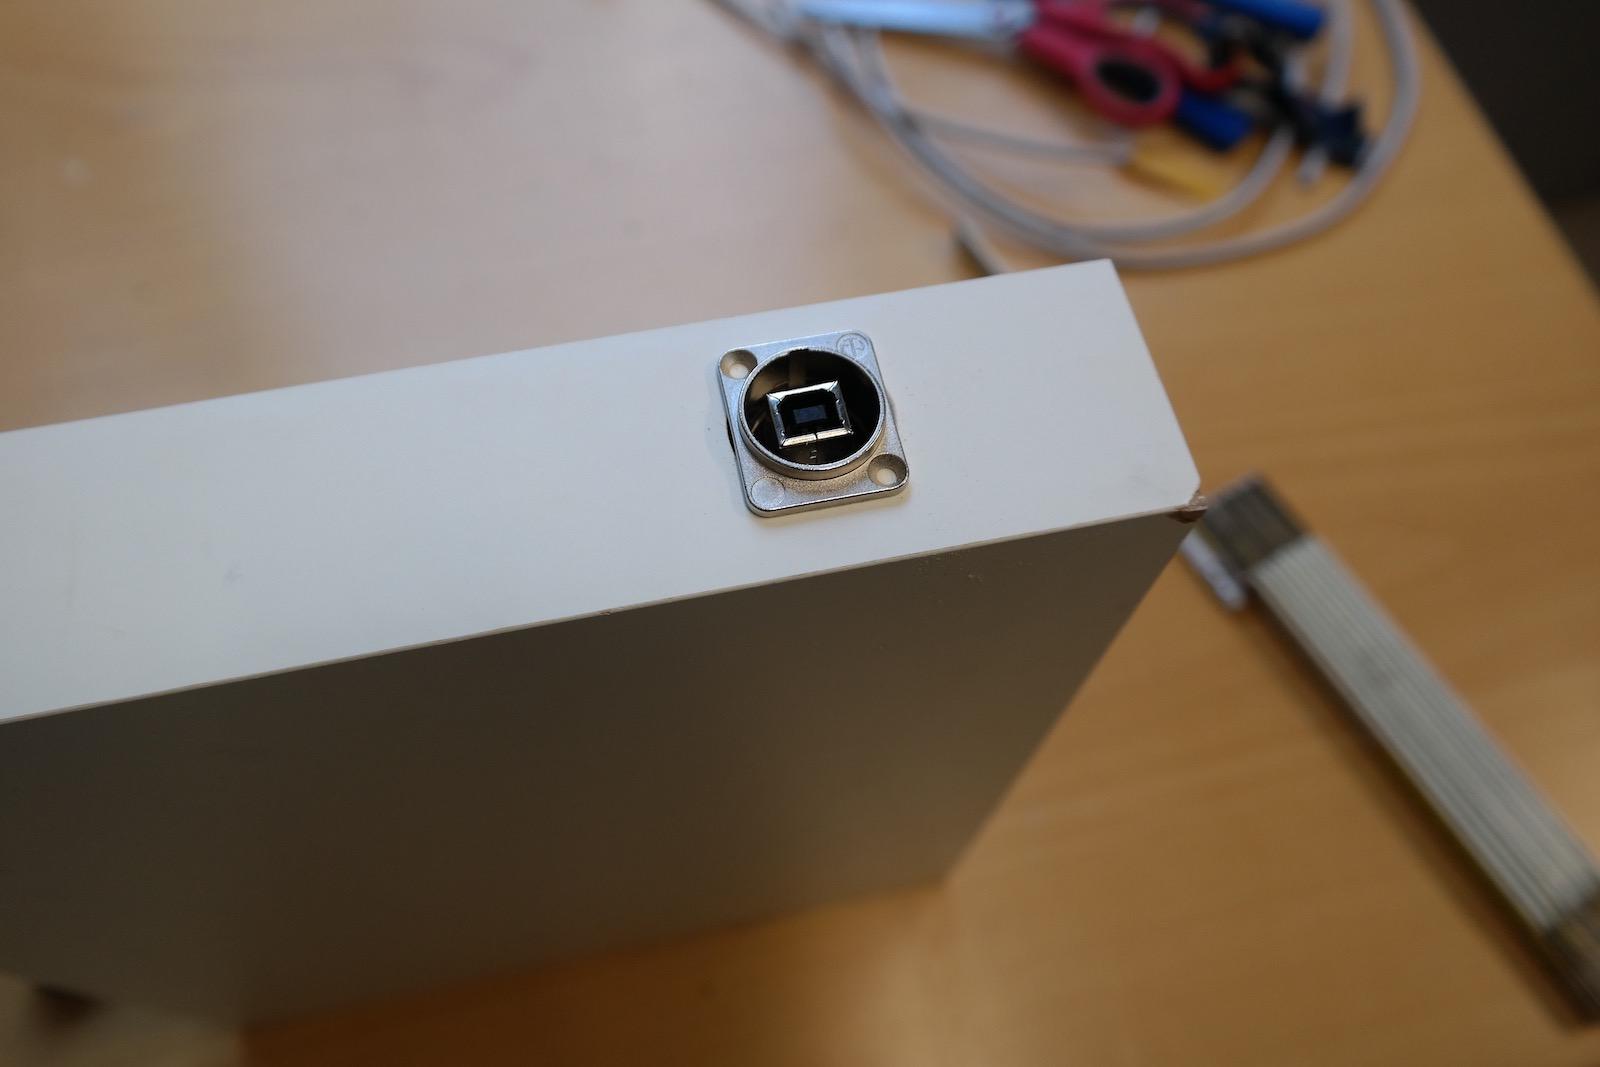 images/hardware/11_usbplug.jpg